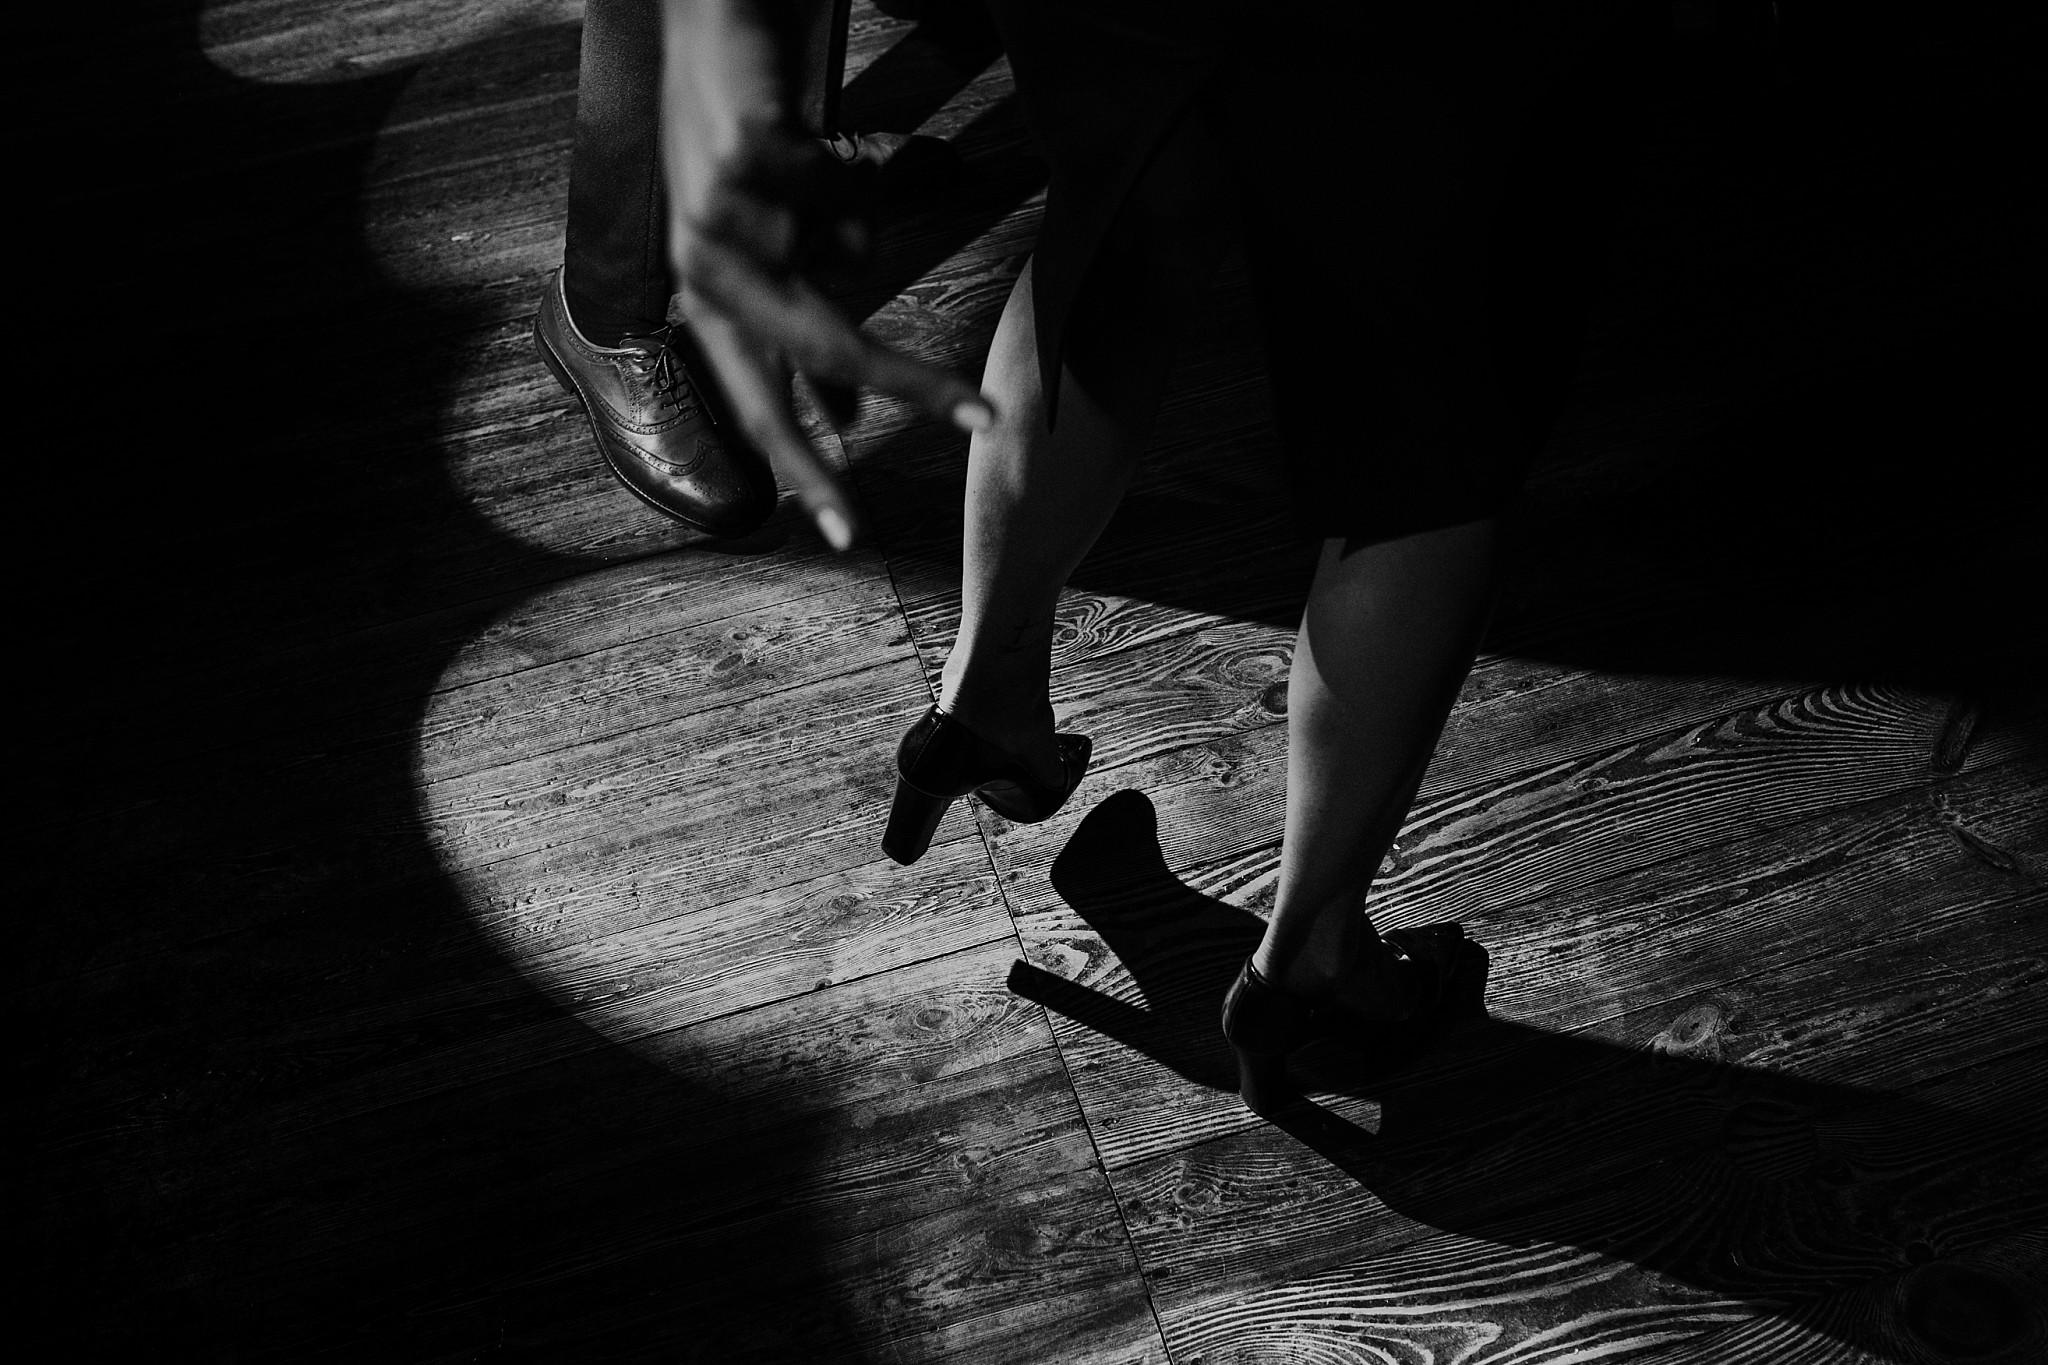 fotograf poznan wesele dobra truskawka piekne wesele pod poznaniem wesele w dobrej truskawce piekna para mloda slub marzen slub koronawirus slub listopad wesele koronawirus 477